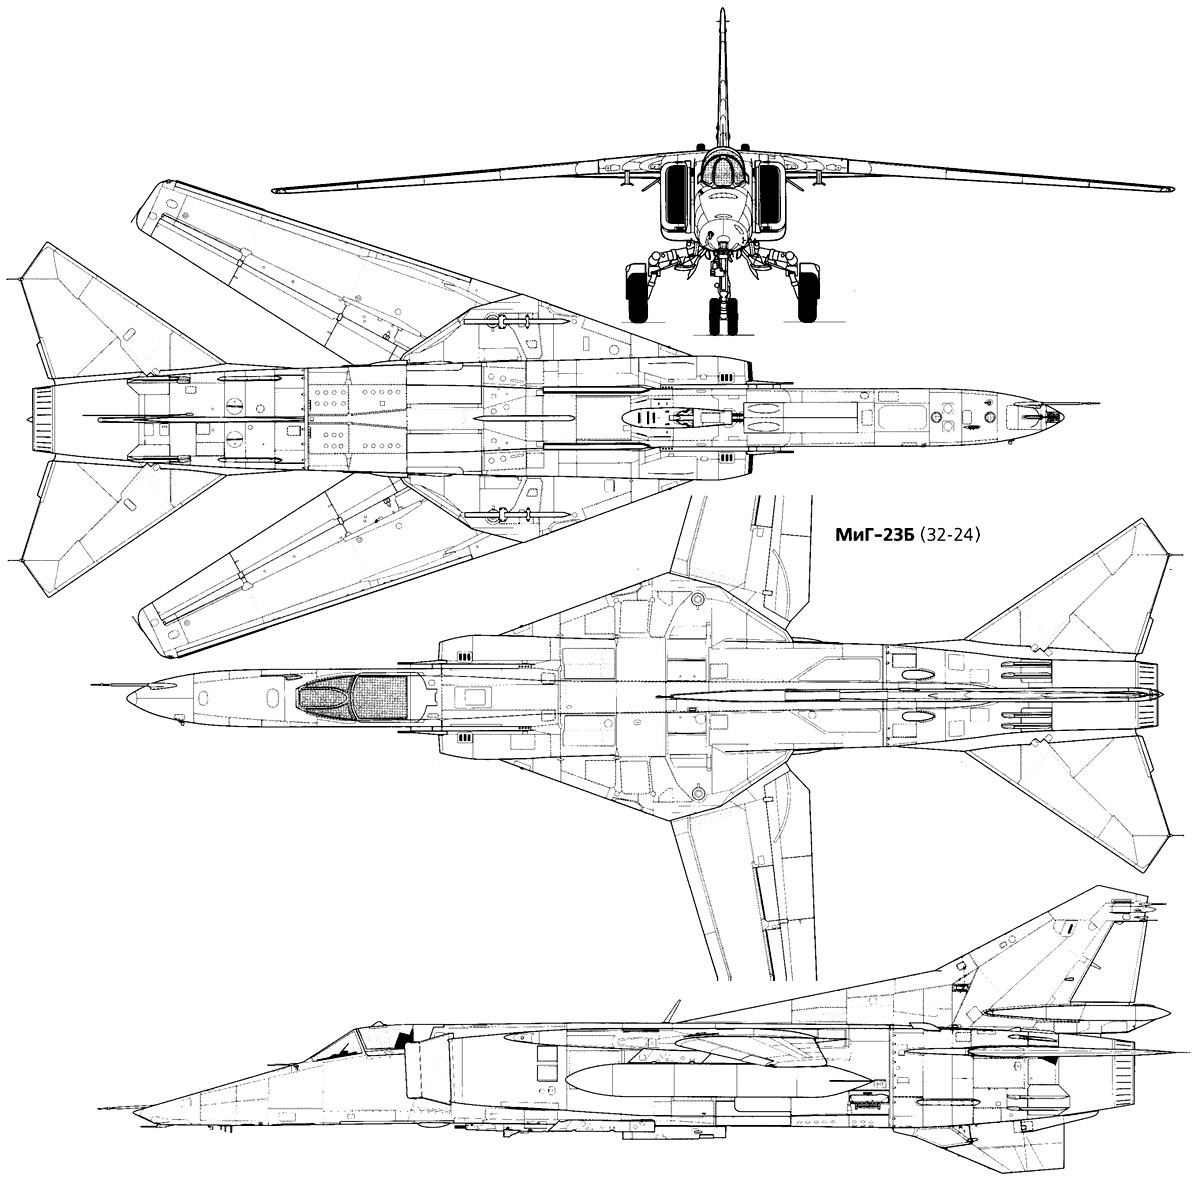 Чертеж истребителя МиГ-23Б